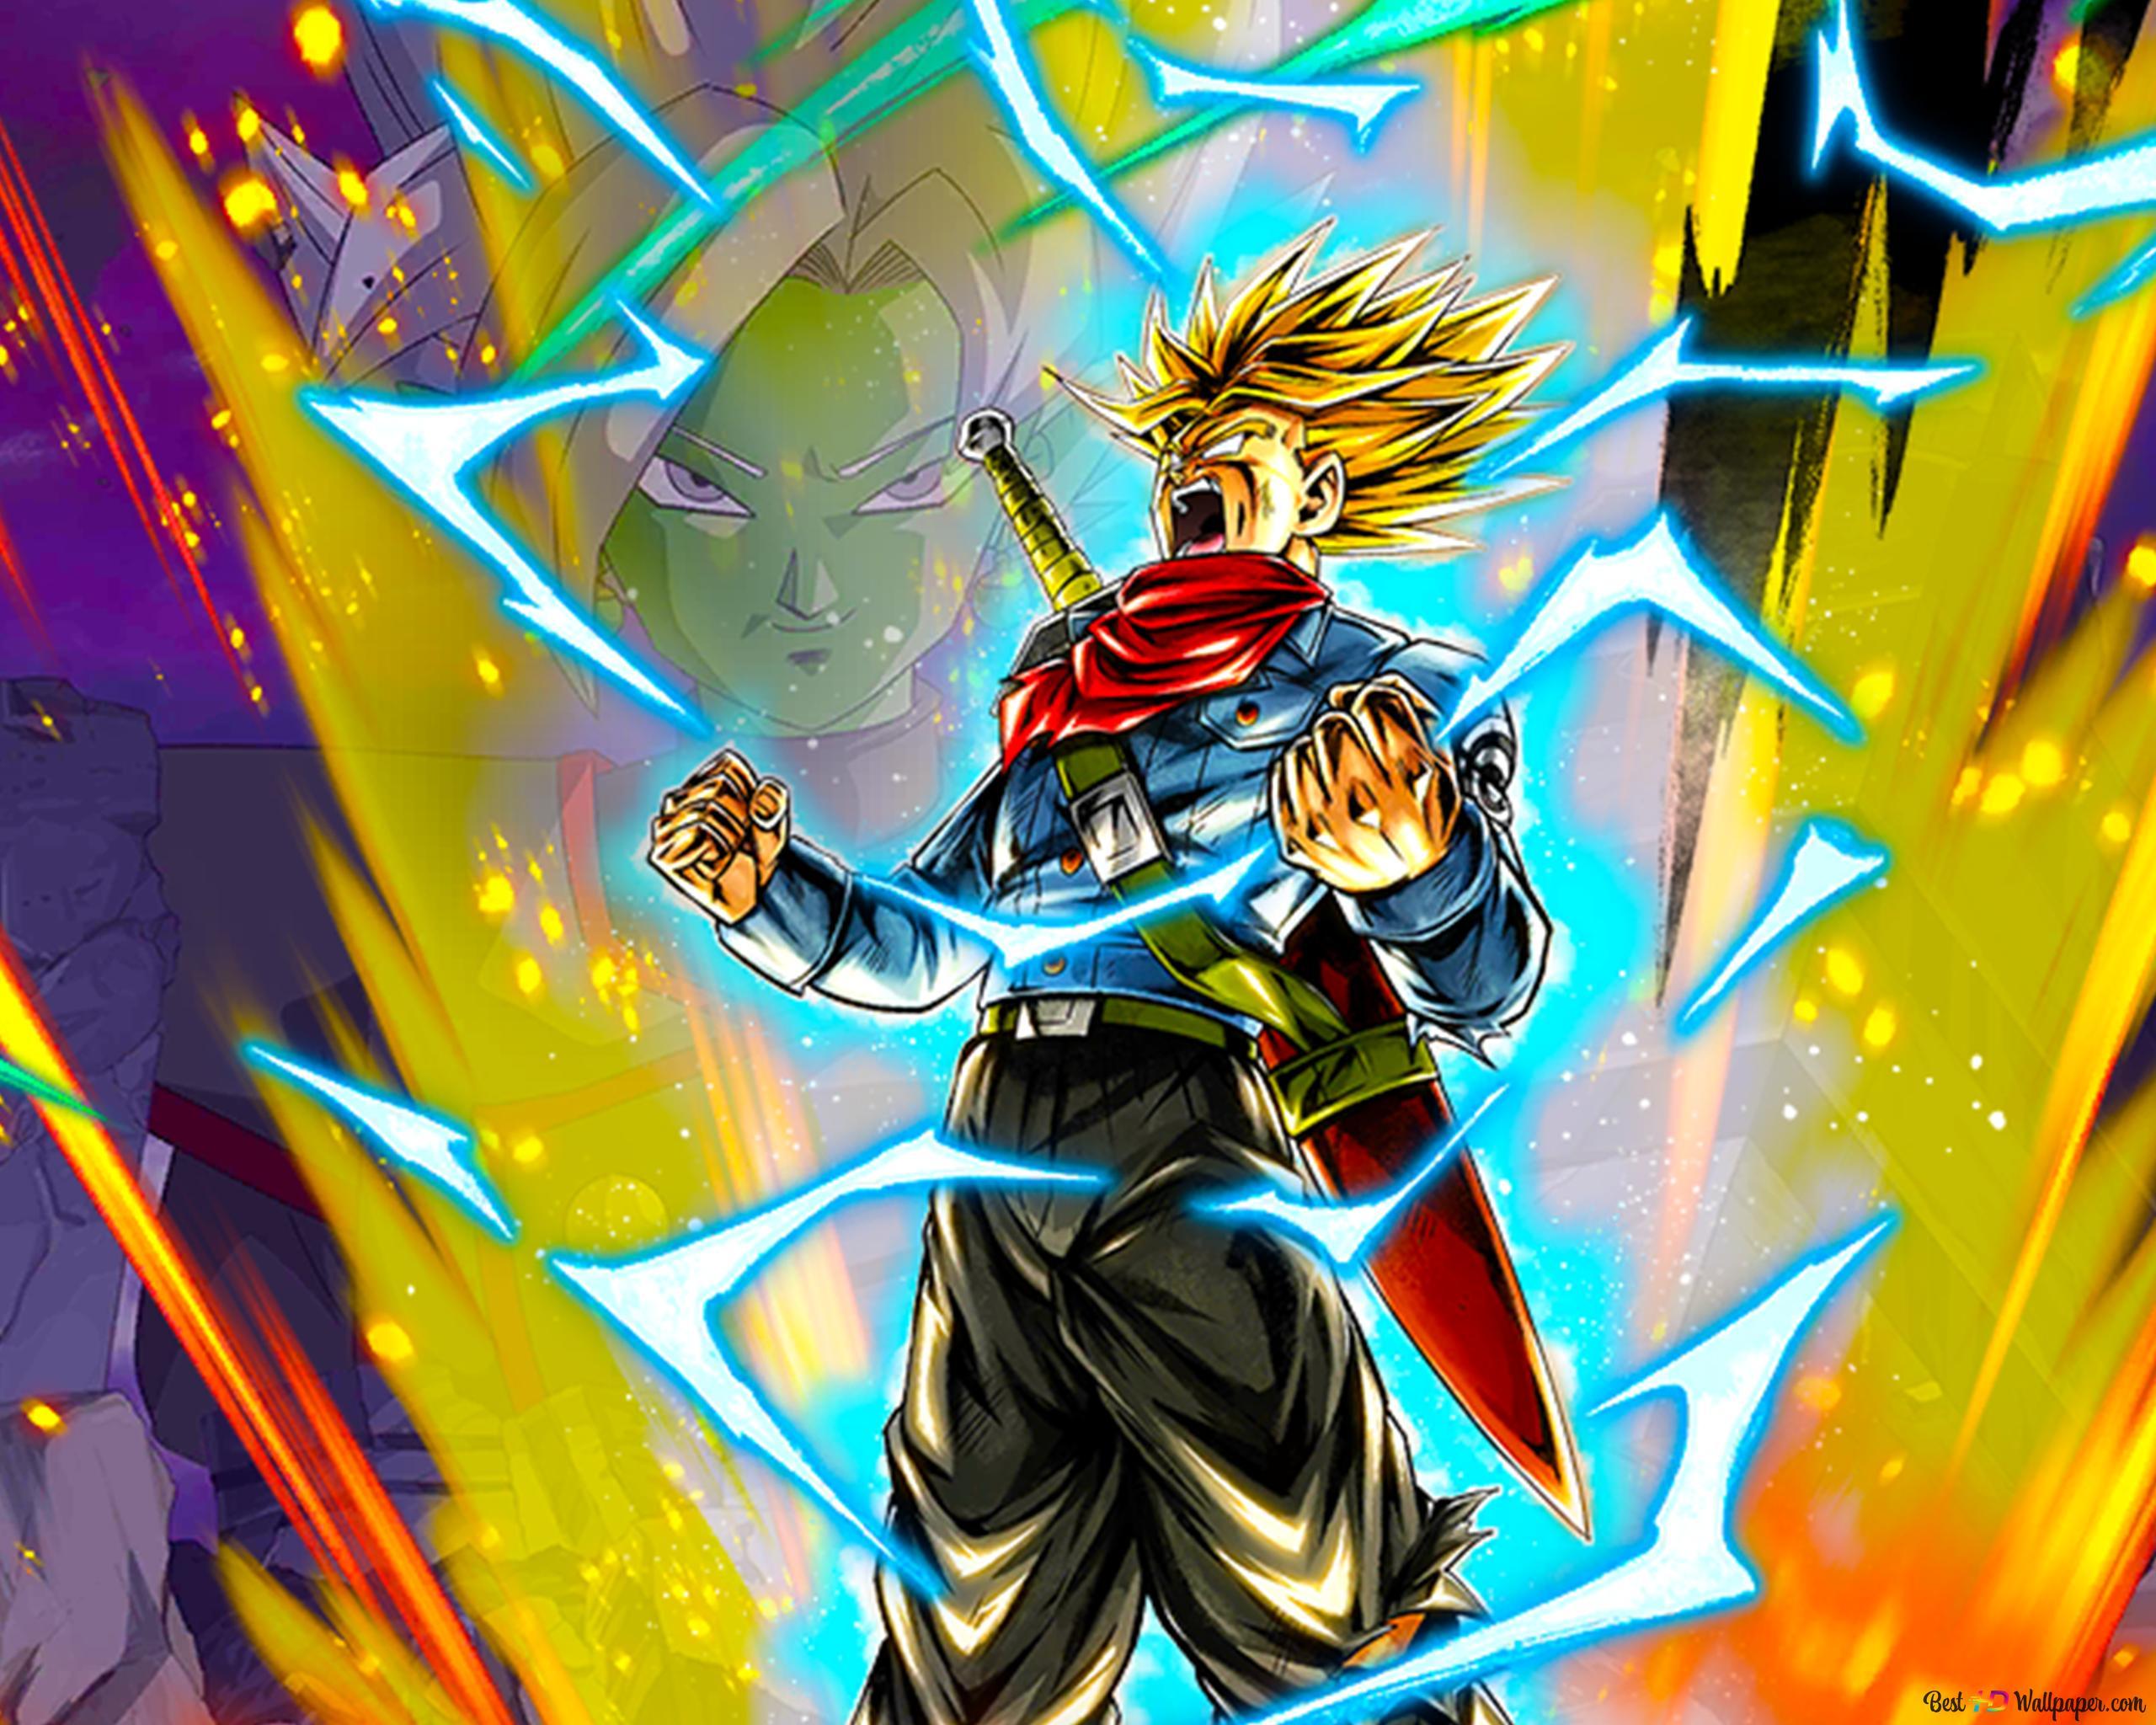 Super Saiyan Rage Trunks Dari Dragon Ball Super Dragon Ball Legends Arts Untuk Desktop Unduhan Wallpaper Hd